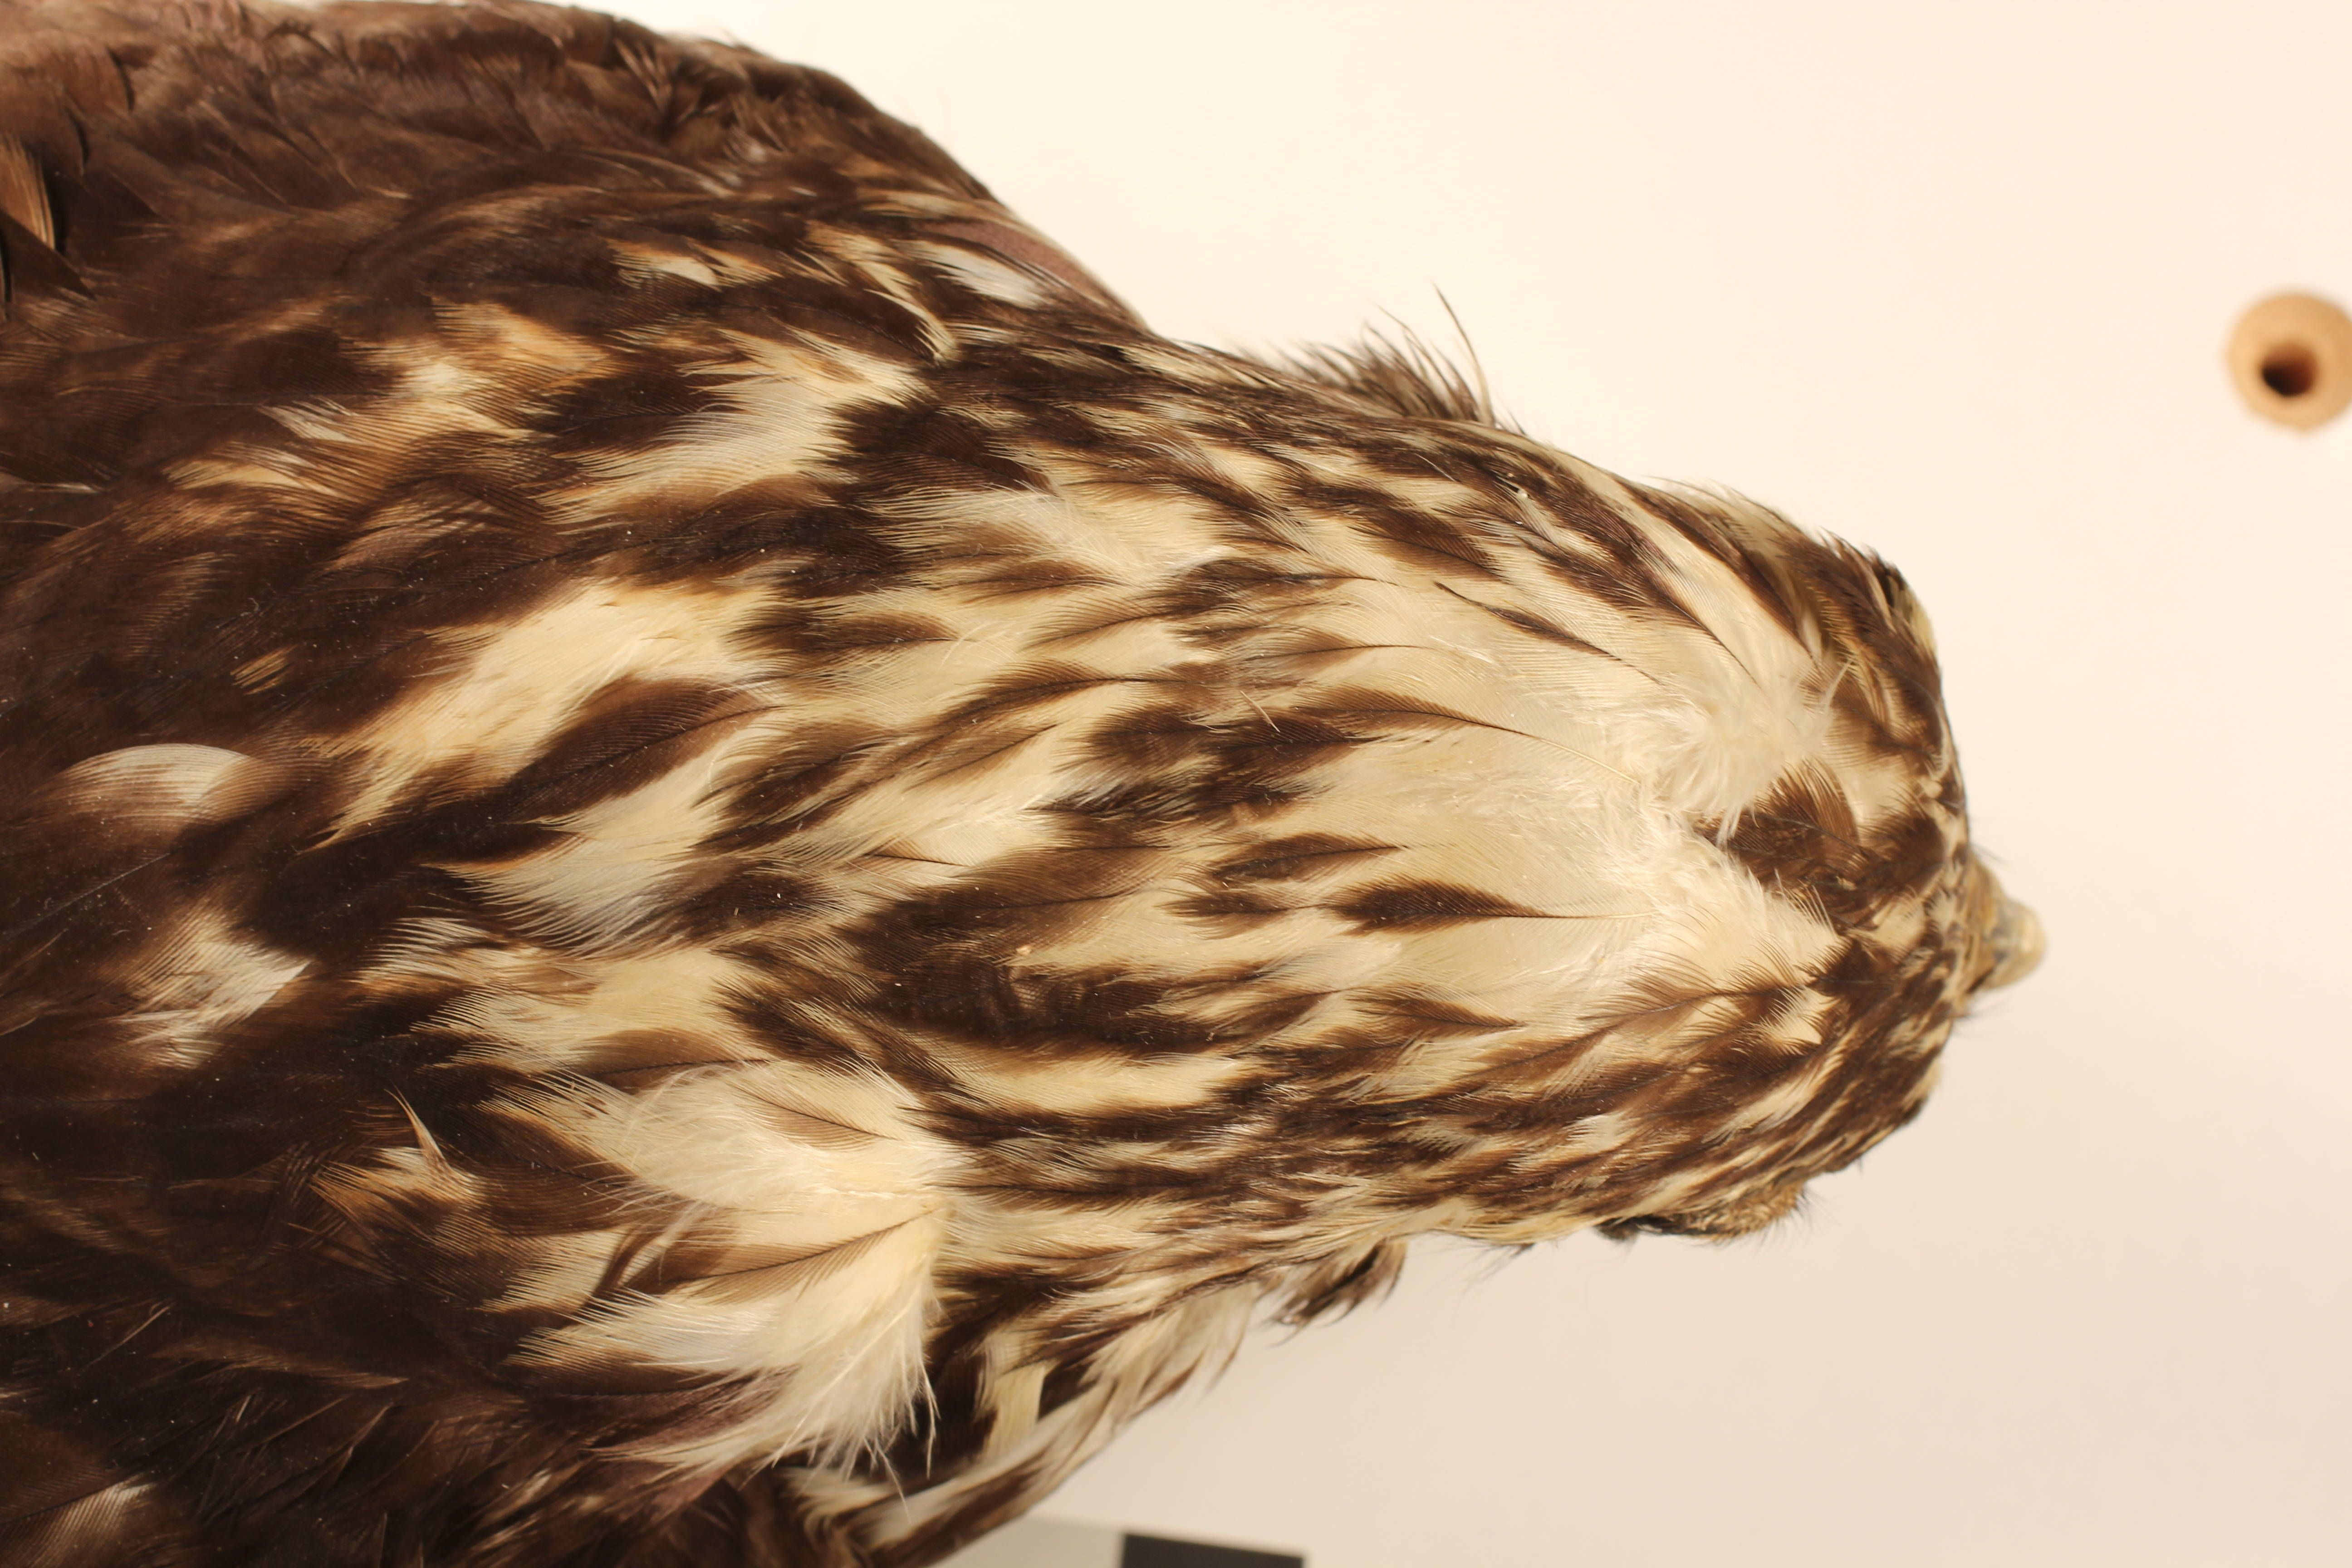 http://media.eol.org/content/2013/02/10/15/78150_orig.jpg  Smithsonian institution - division of birds